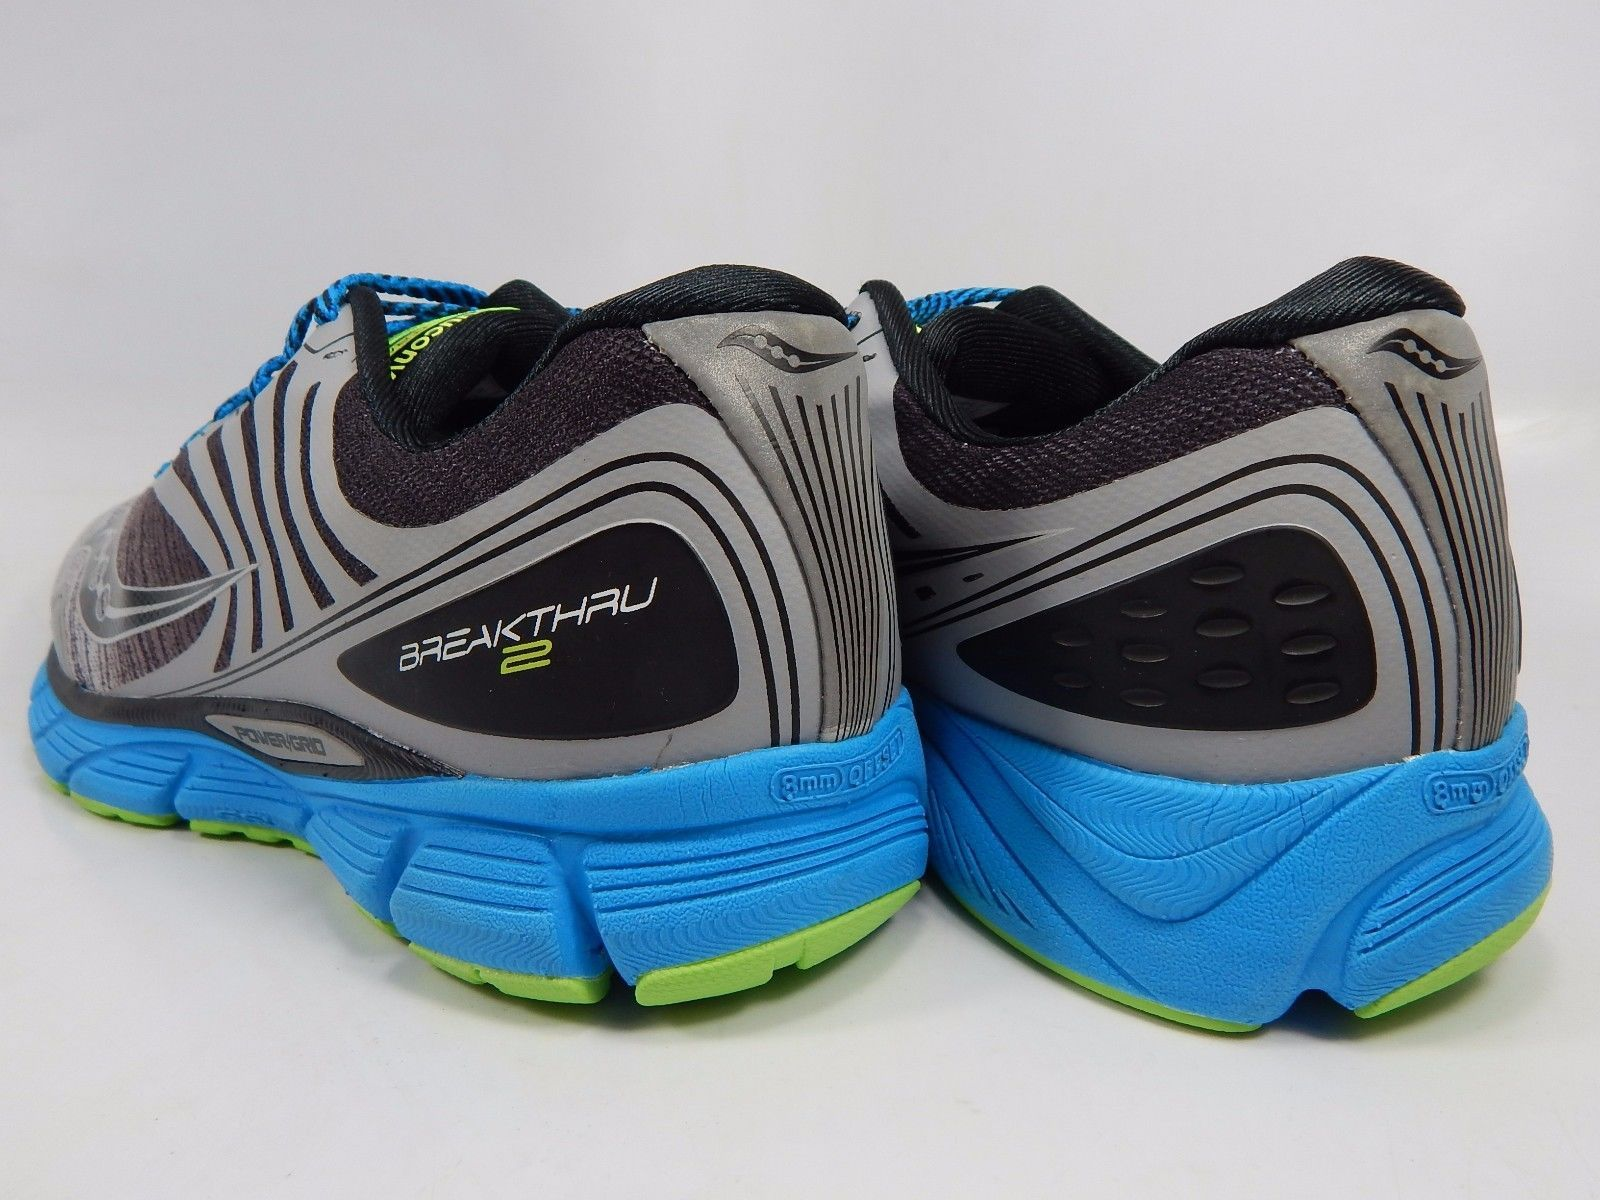 Saucony Breakthru 2 Men's Running Shoes Size US 9 M (D) EU 42.5 Silver S20304-3